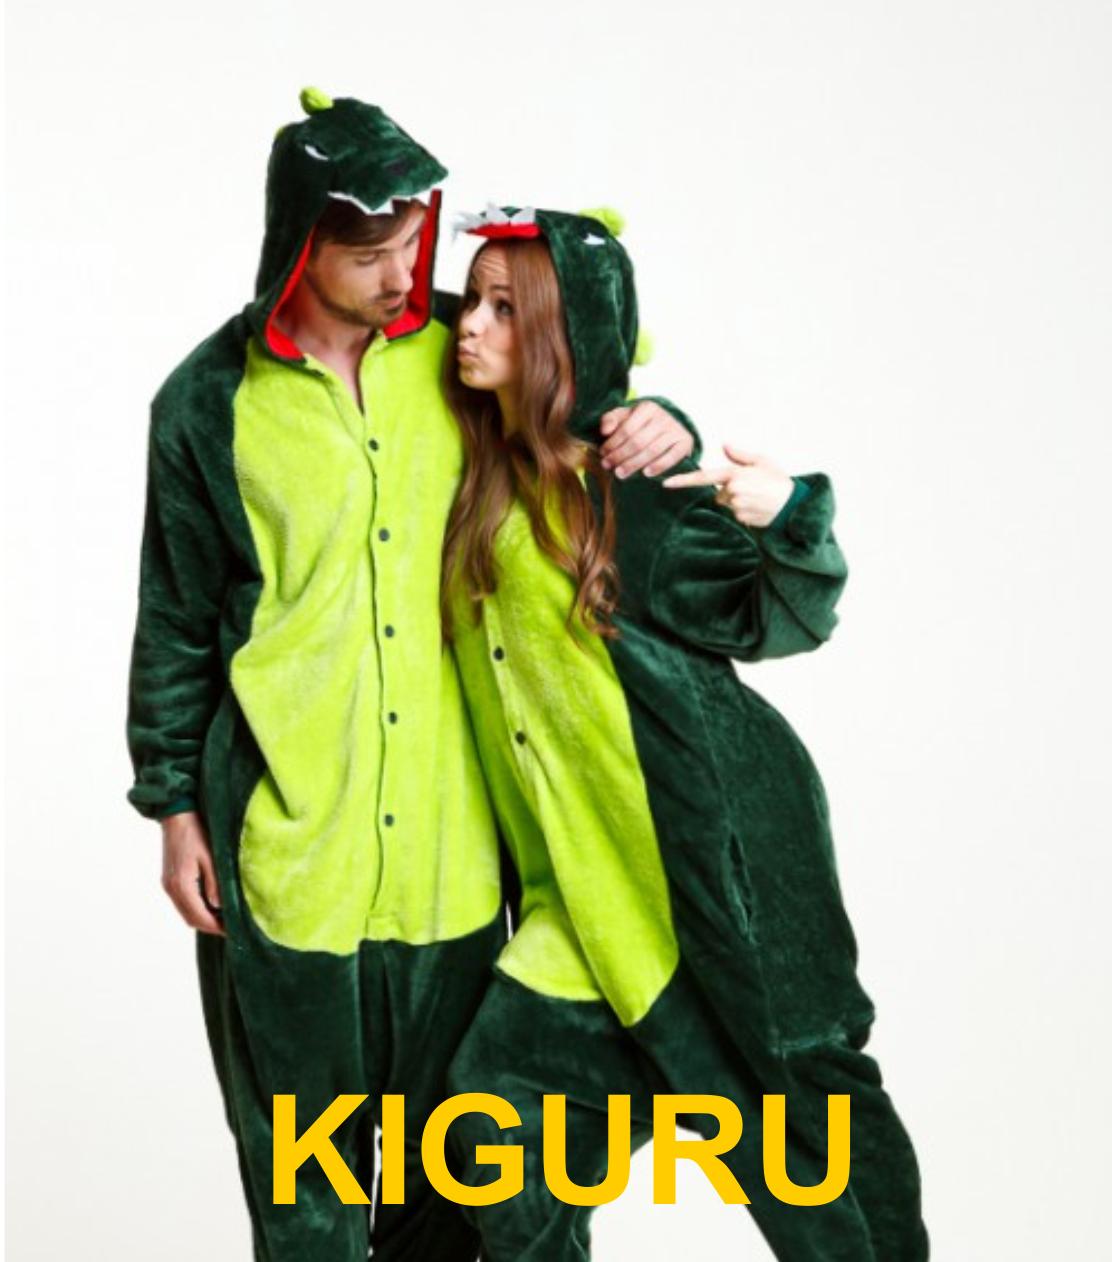 Пижама кигуруми костюм для сноуборда Динозавр - KIGURU в Киеве cdedde182edf6